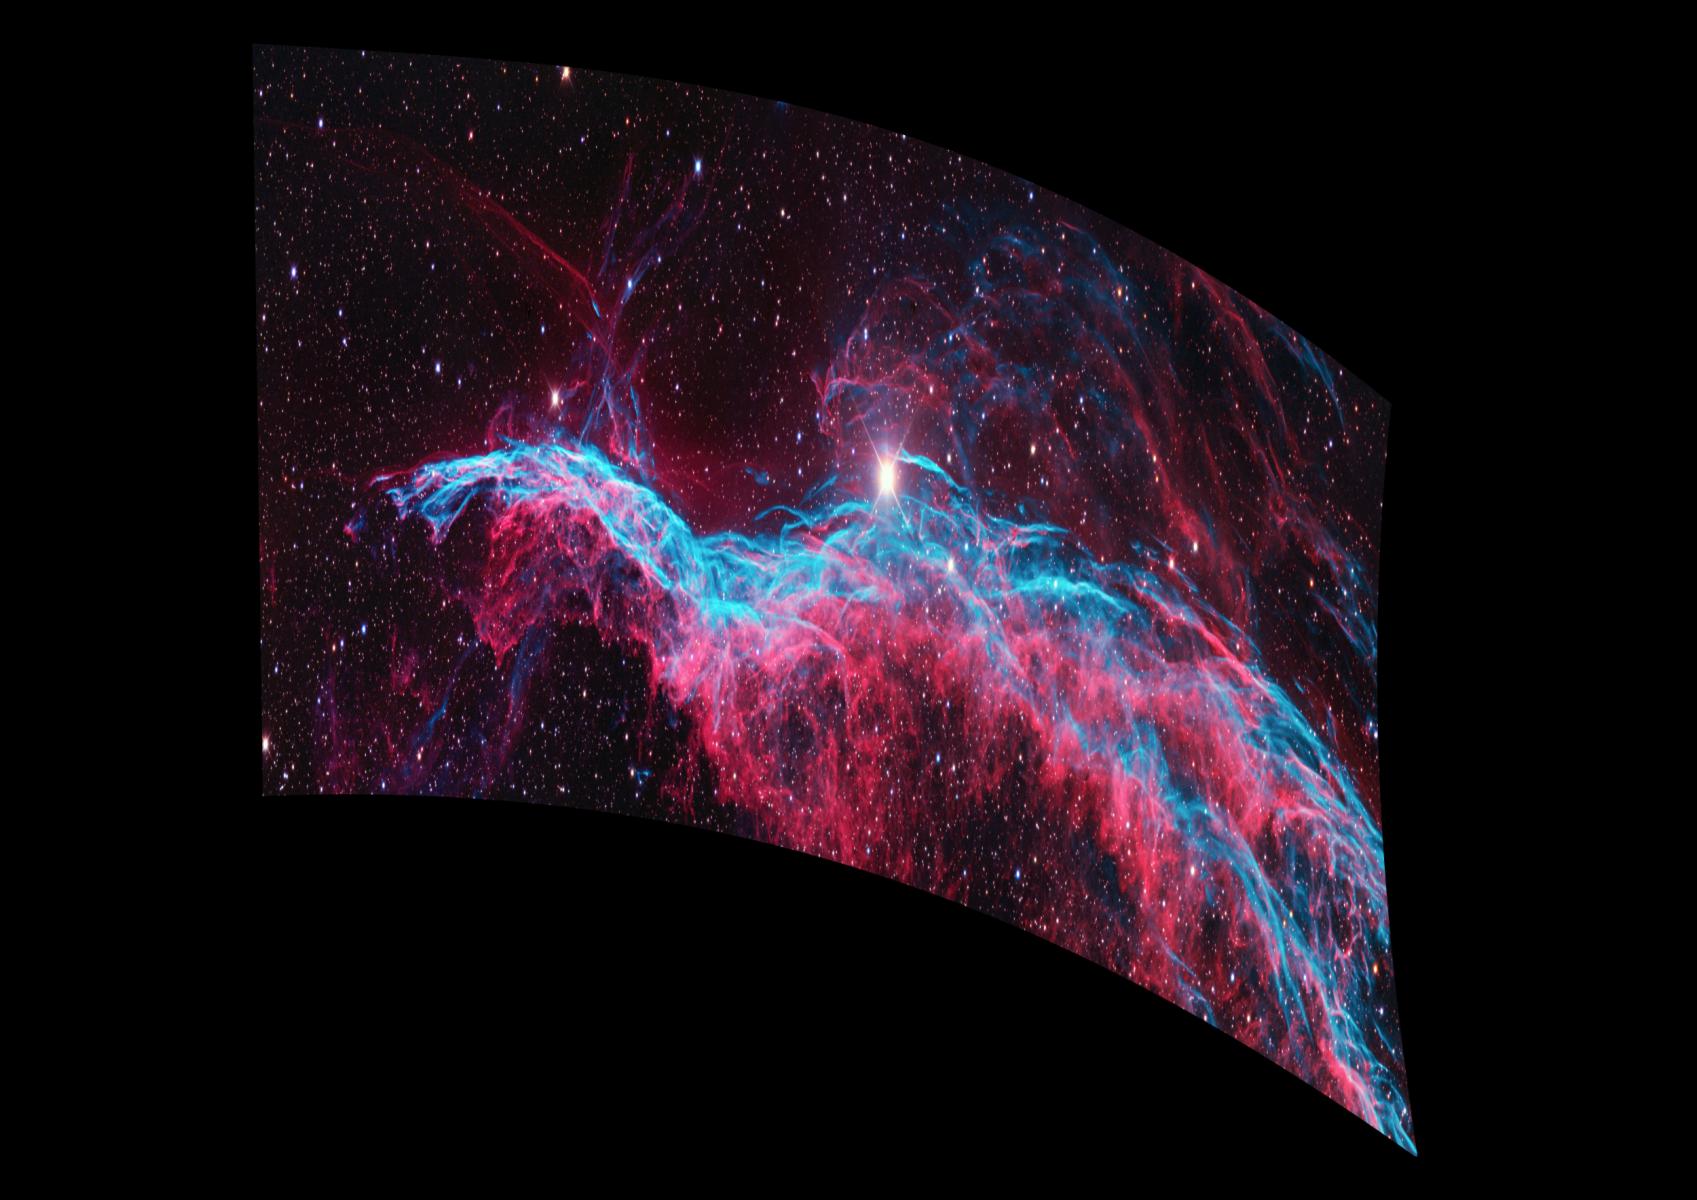 050202s - 36x54 Standard Veil Nebula